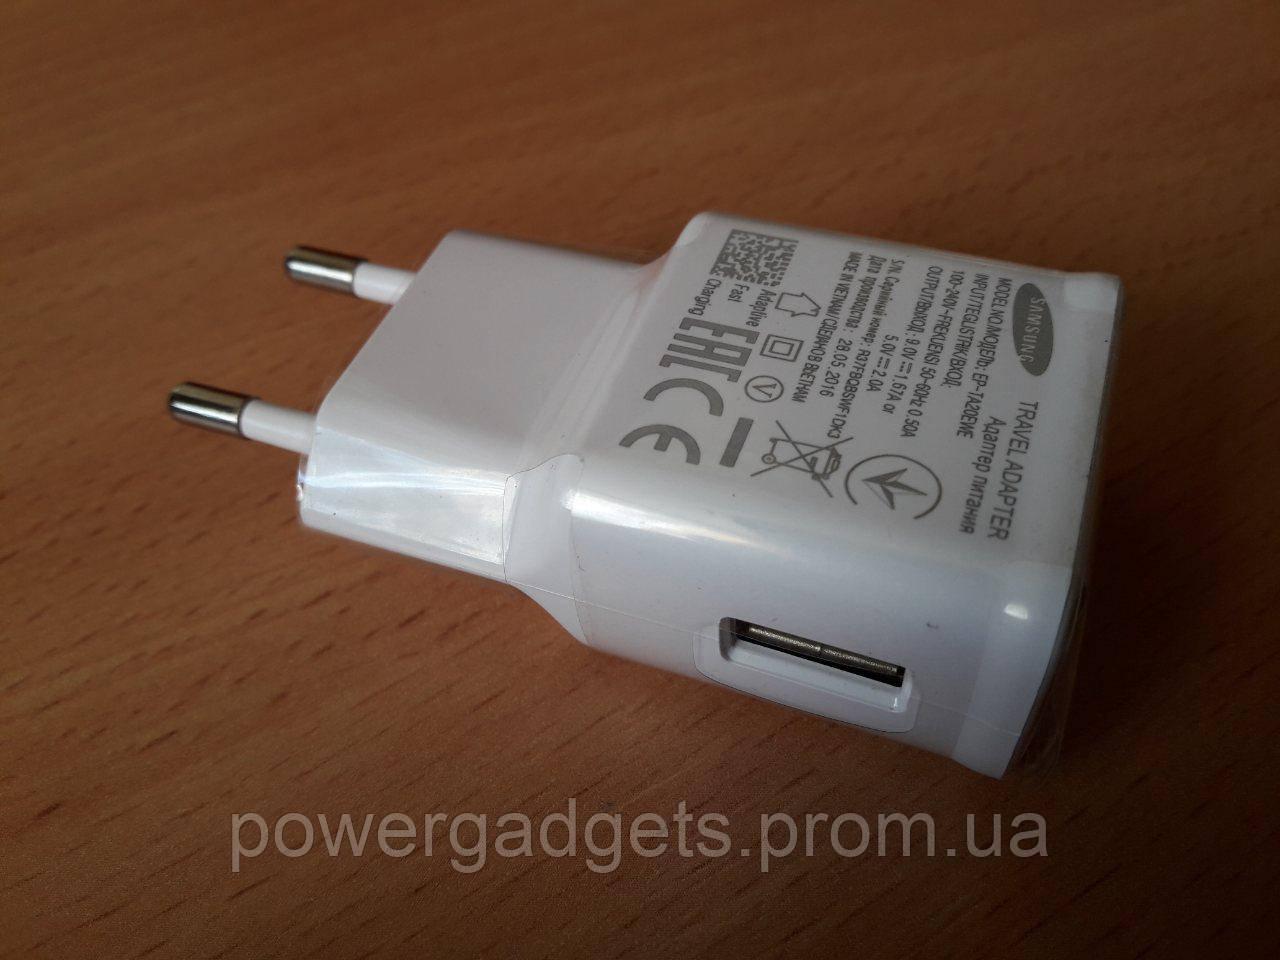 Зарядное устройство Samsung Fast Charging 5V-2A, 9V-1.67A